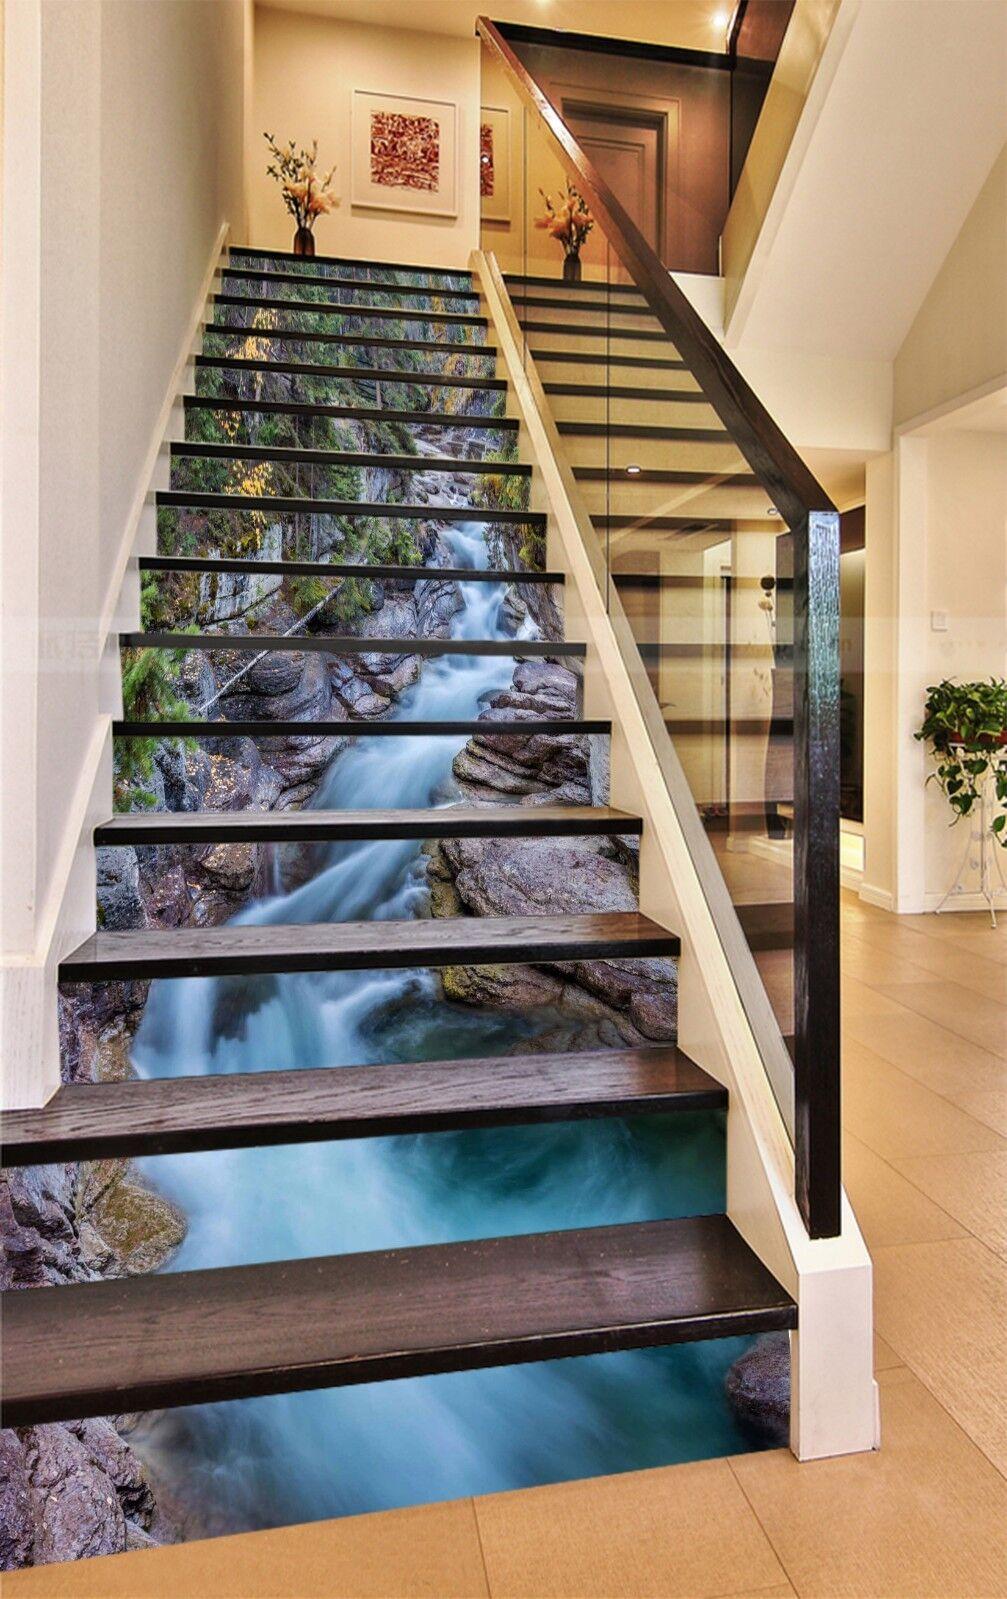 3D Stone water 347 Stair Risers Decoration Photo Mural Vinyl Decal Wallpaper UK